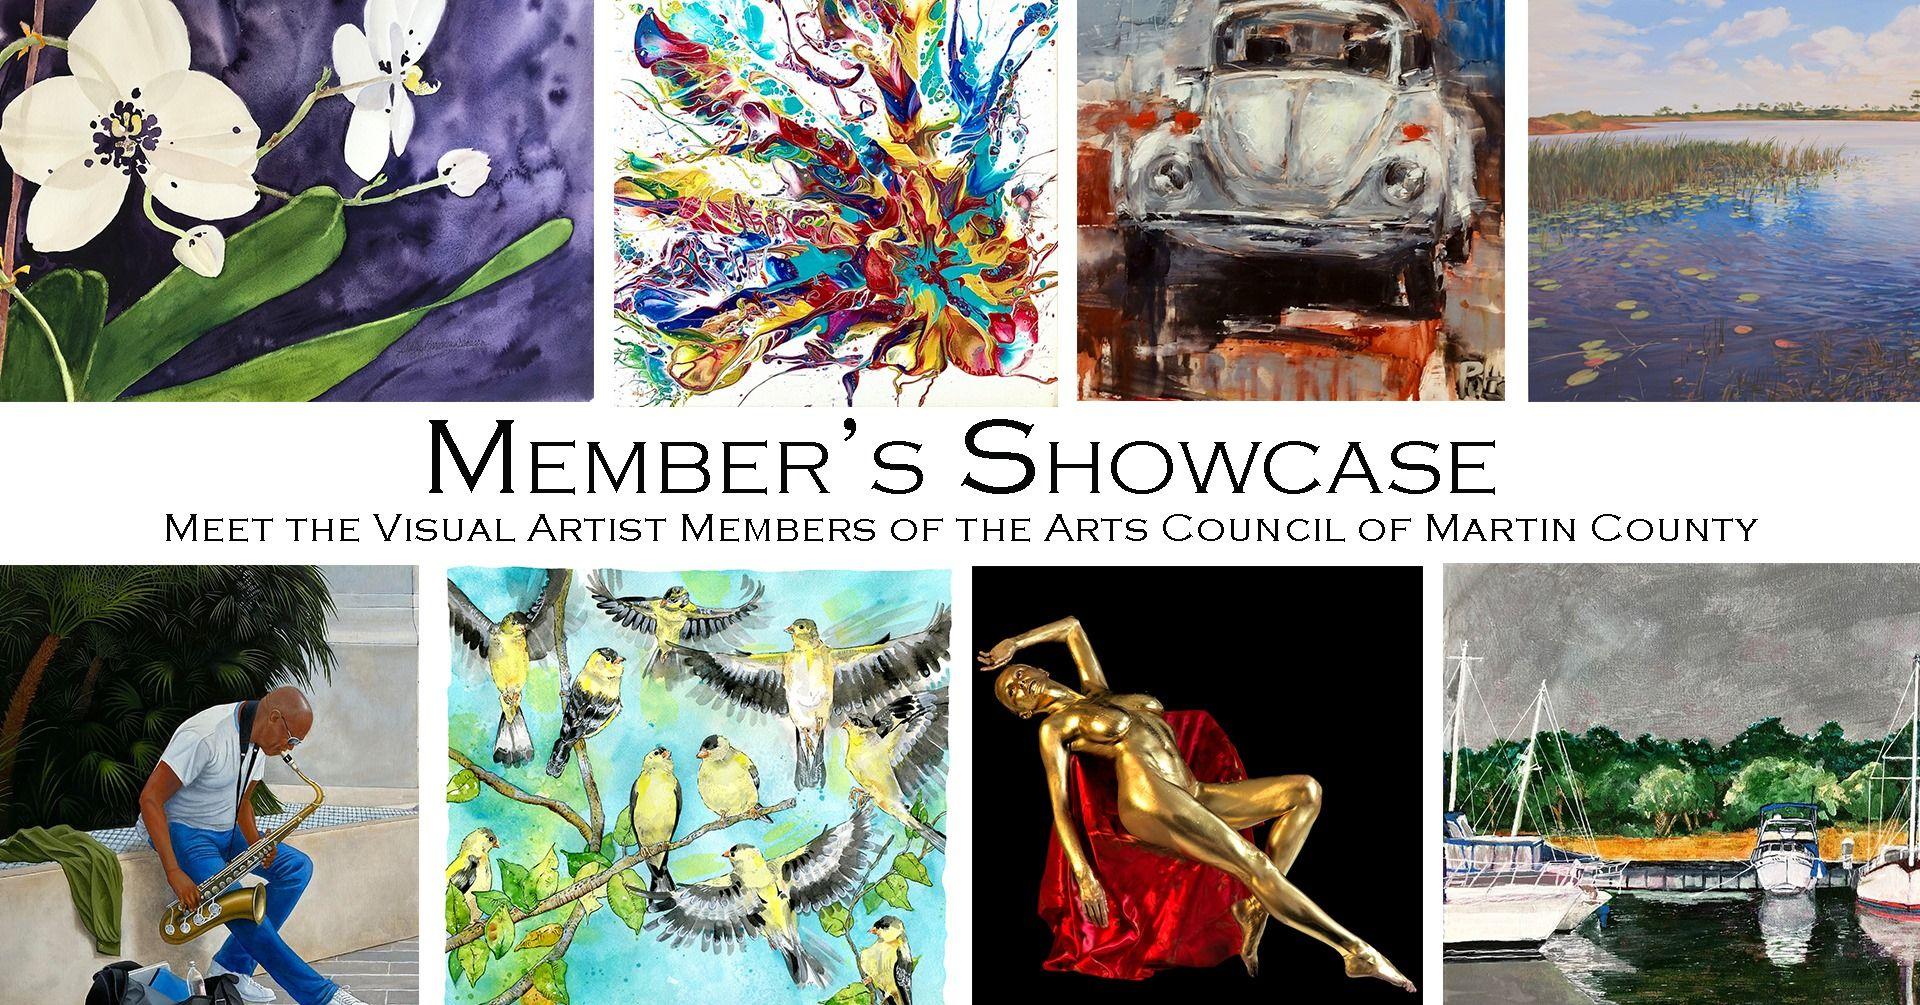 Member's Showcase